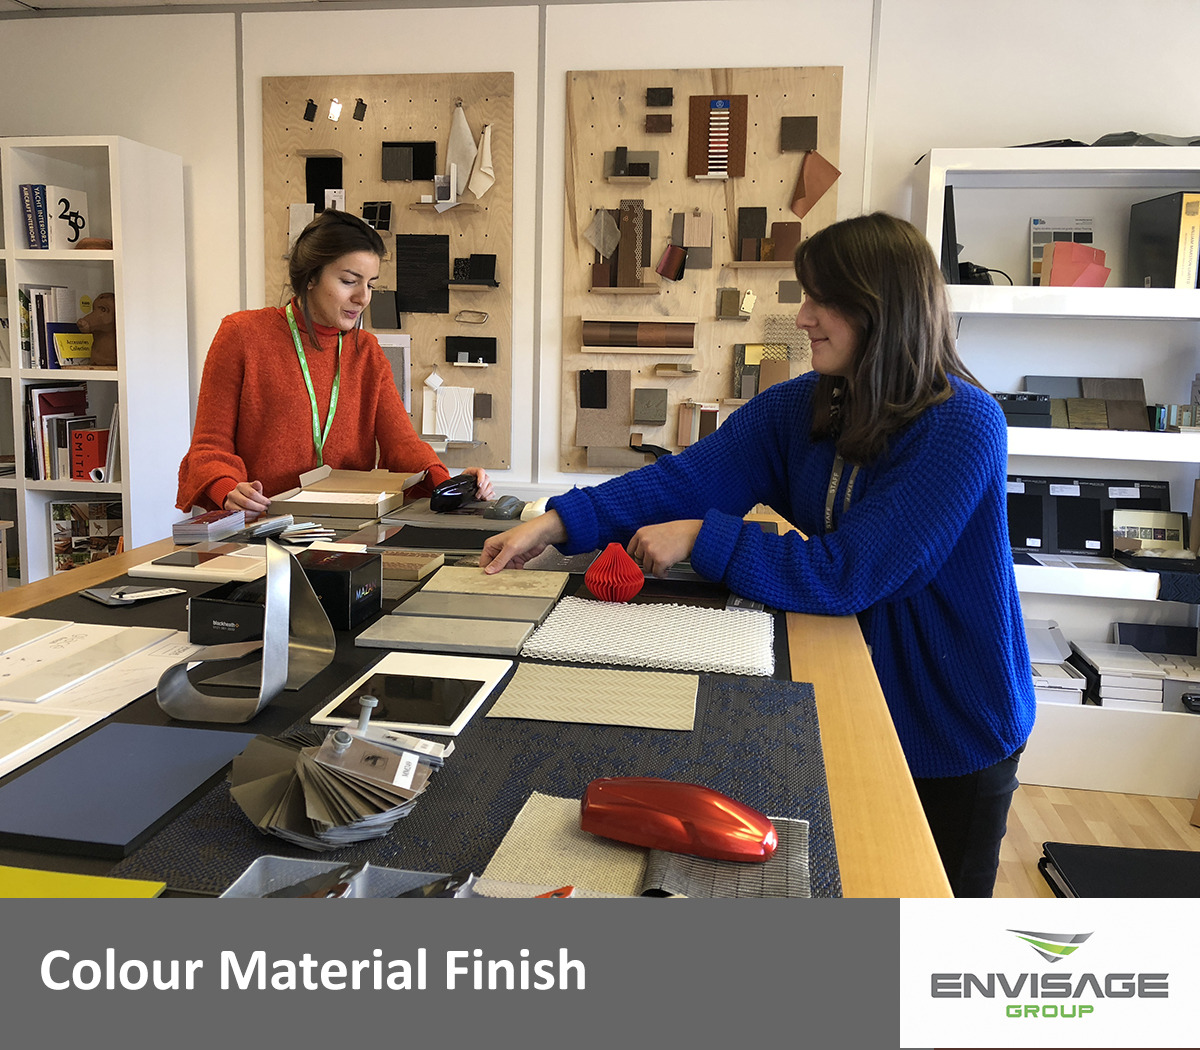 colour-material-finish-2